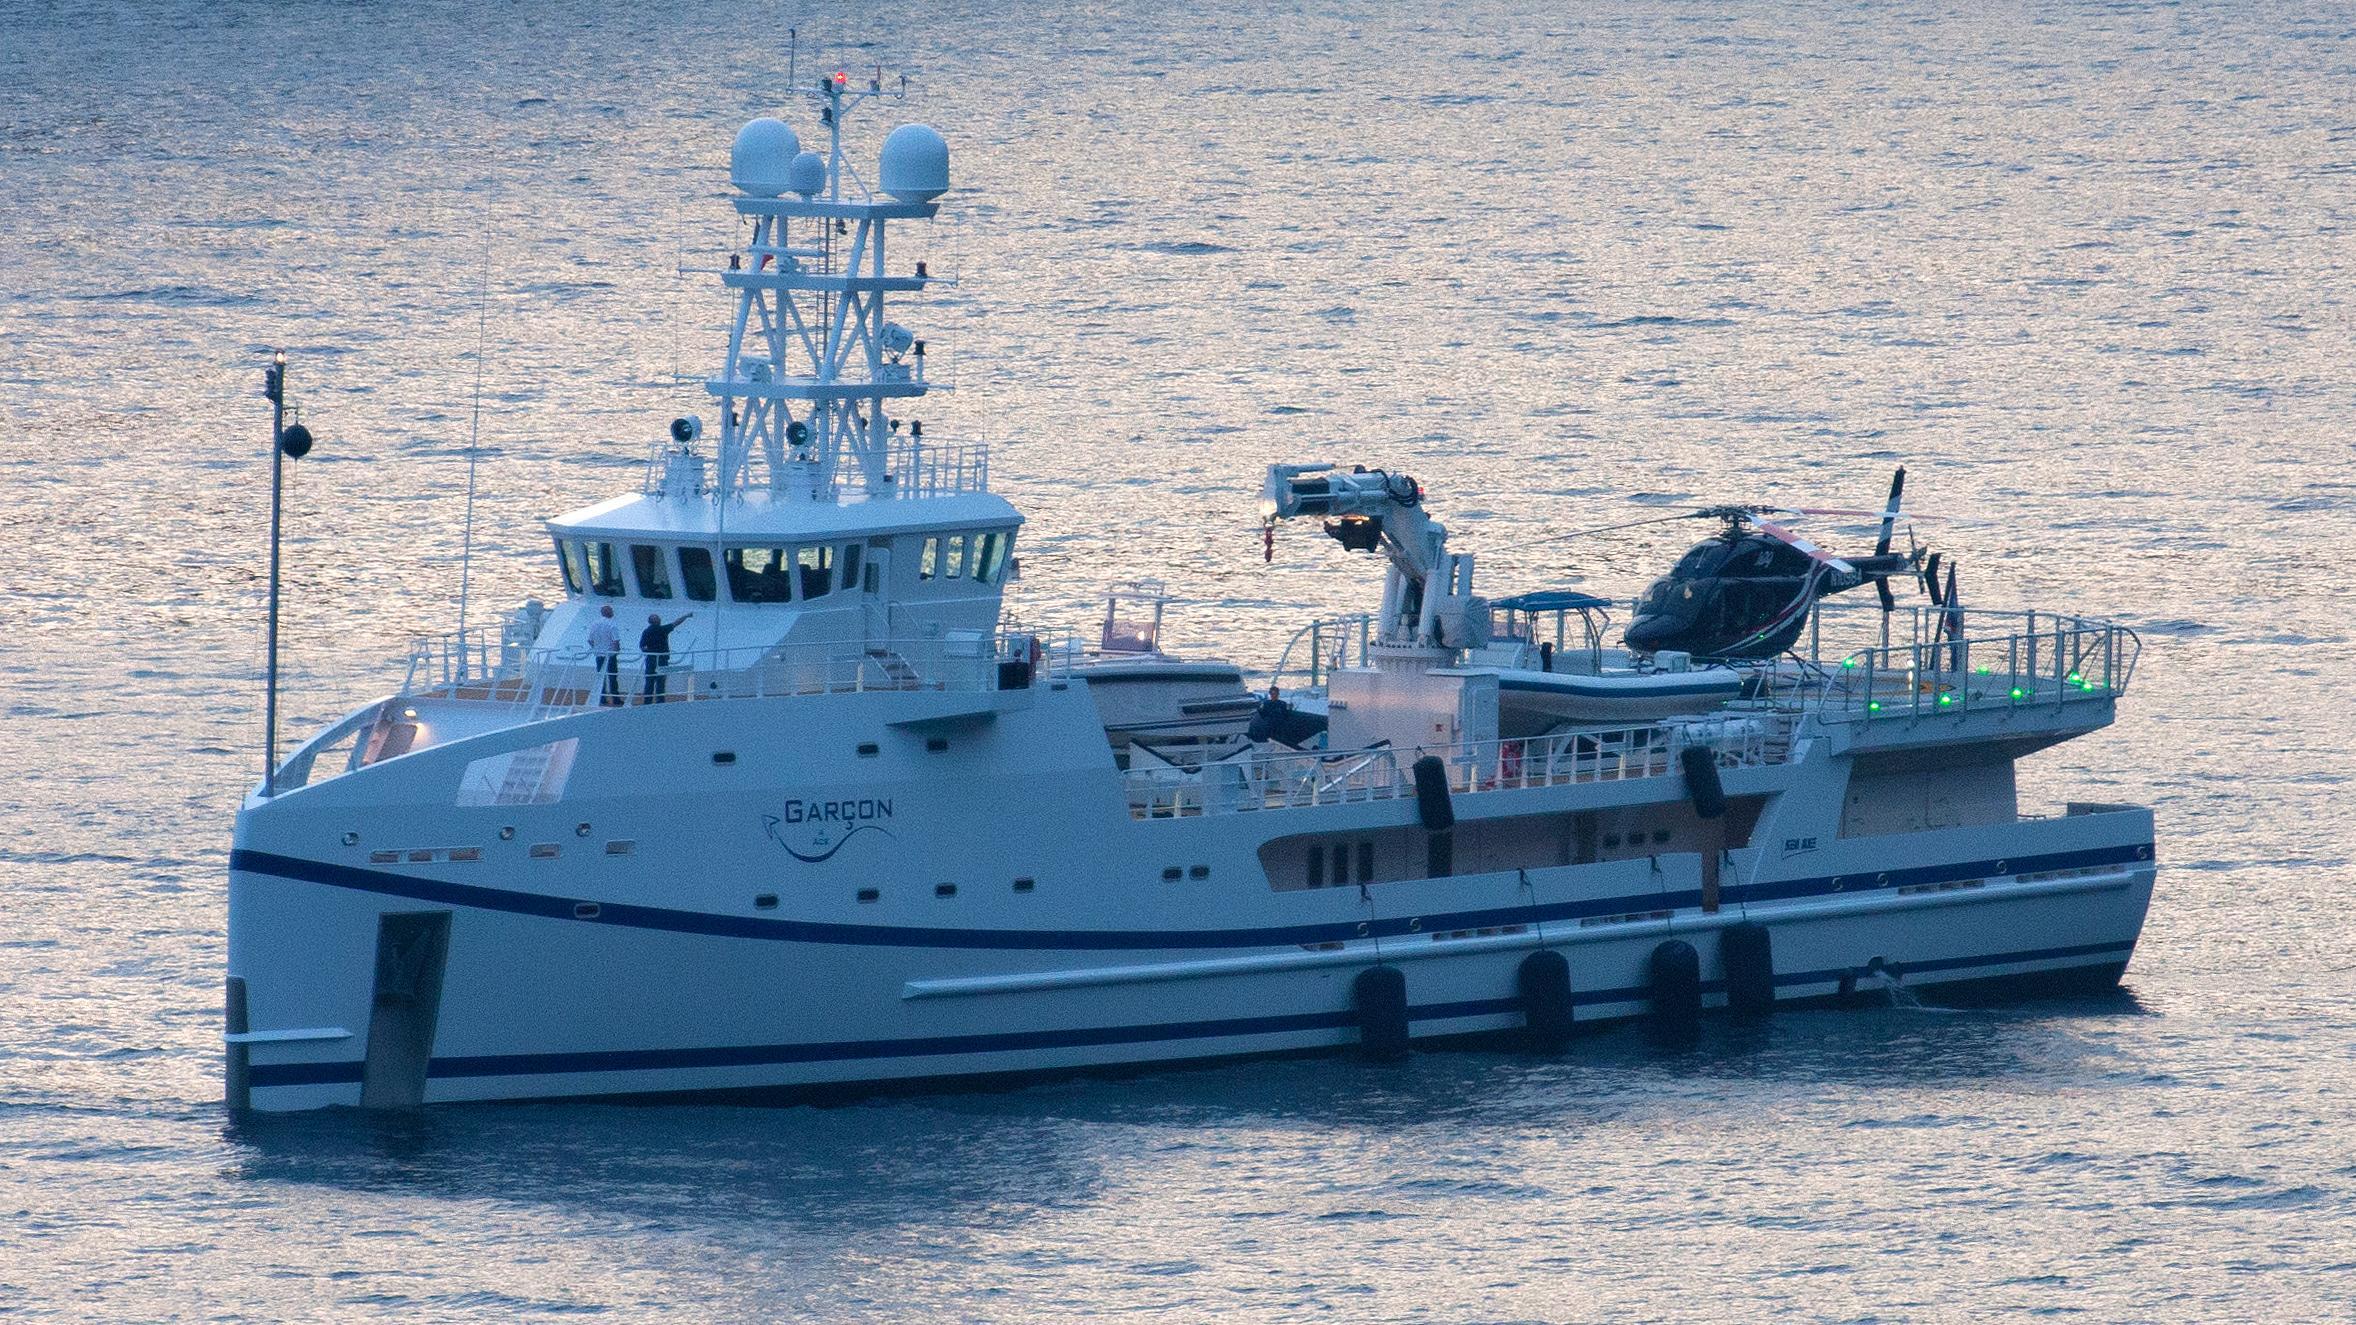 garcon-explorer-yacht-damen-2012-67m-half-profile